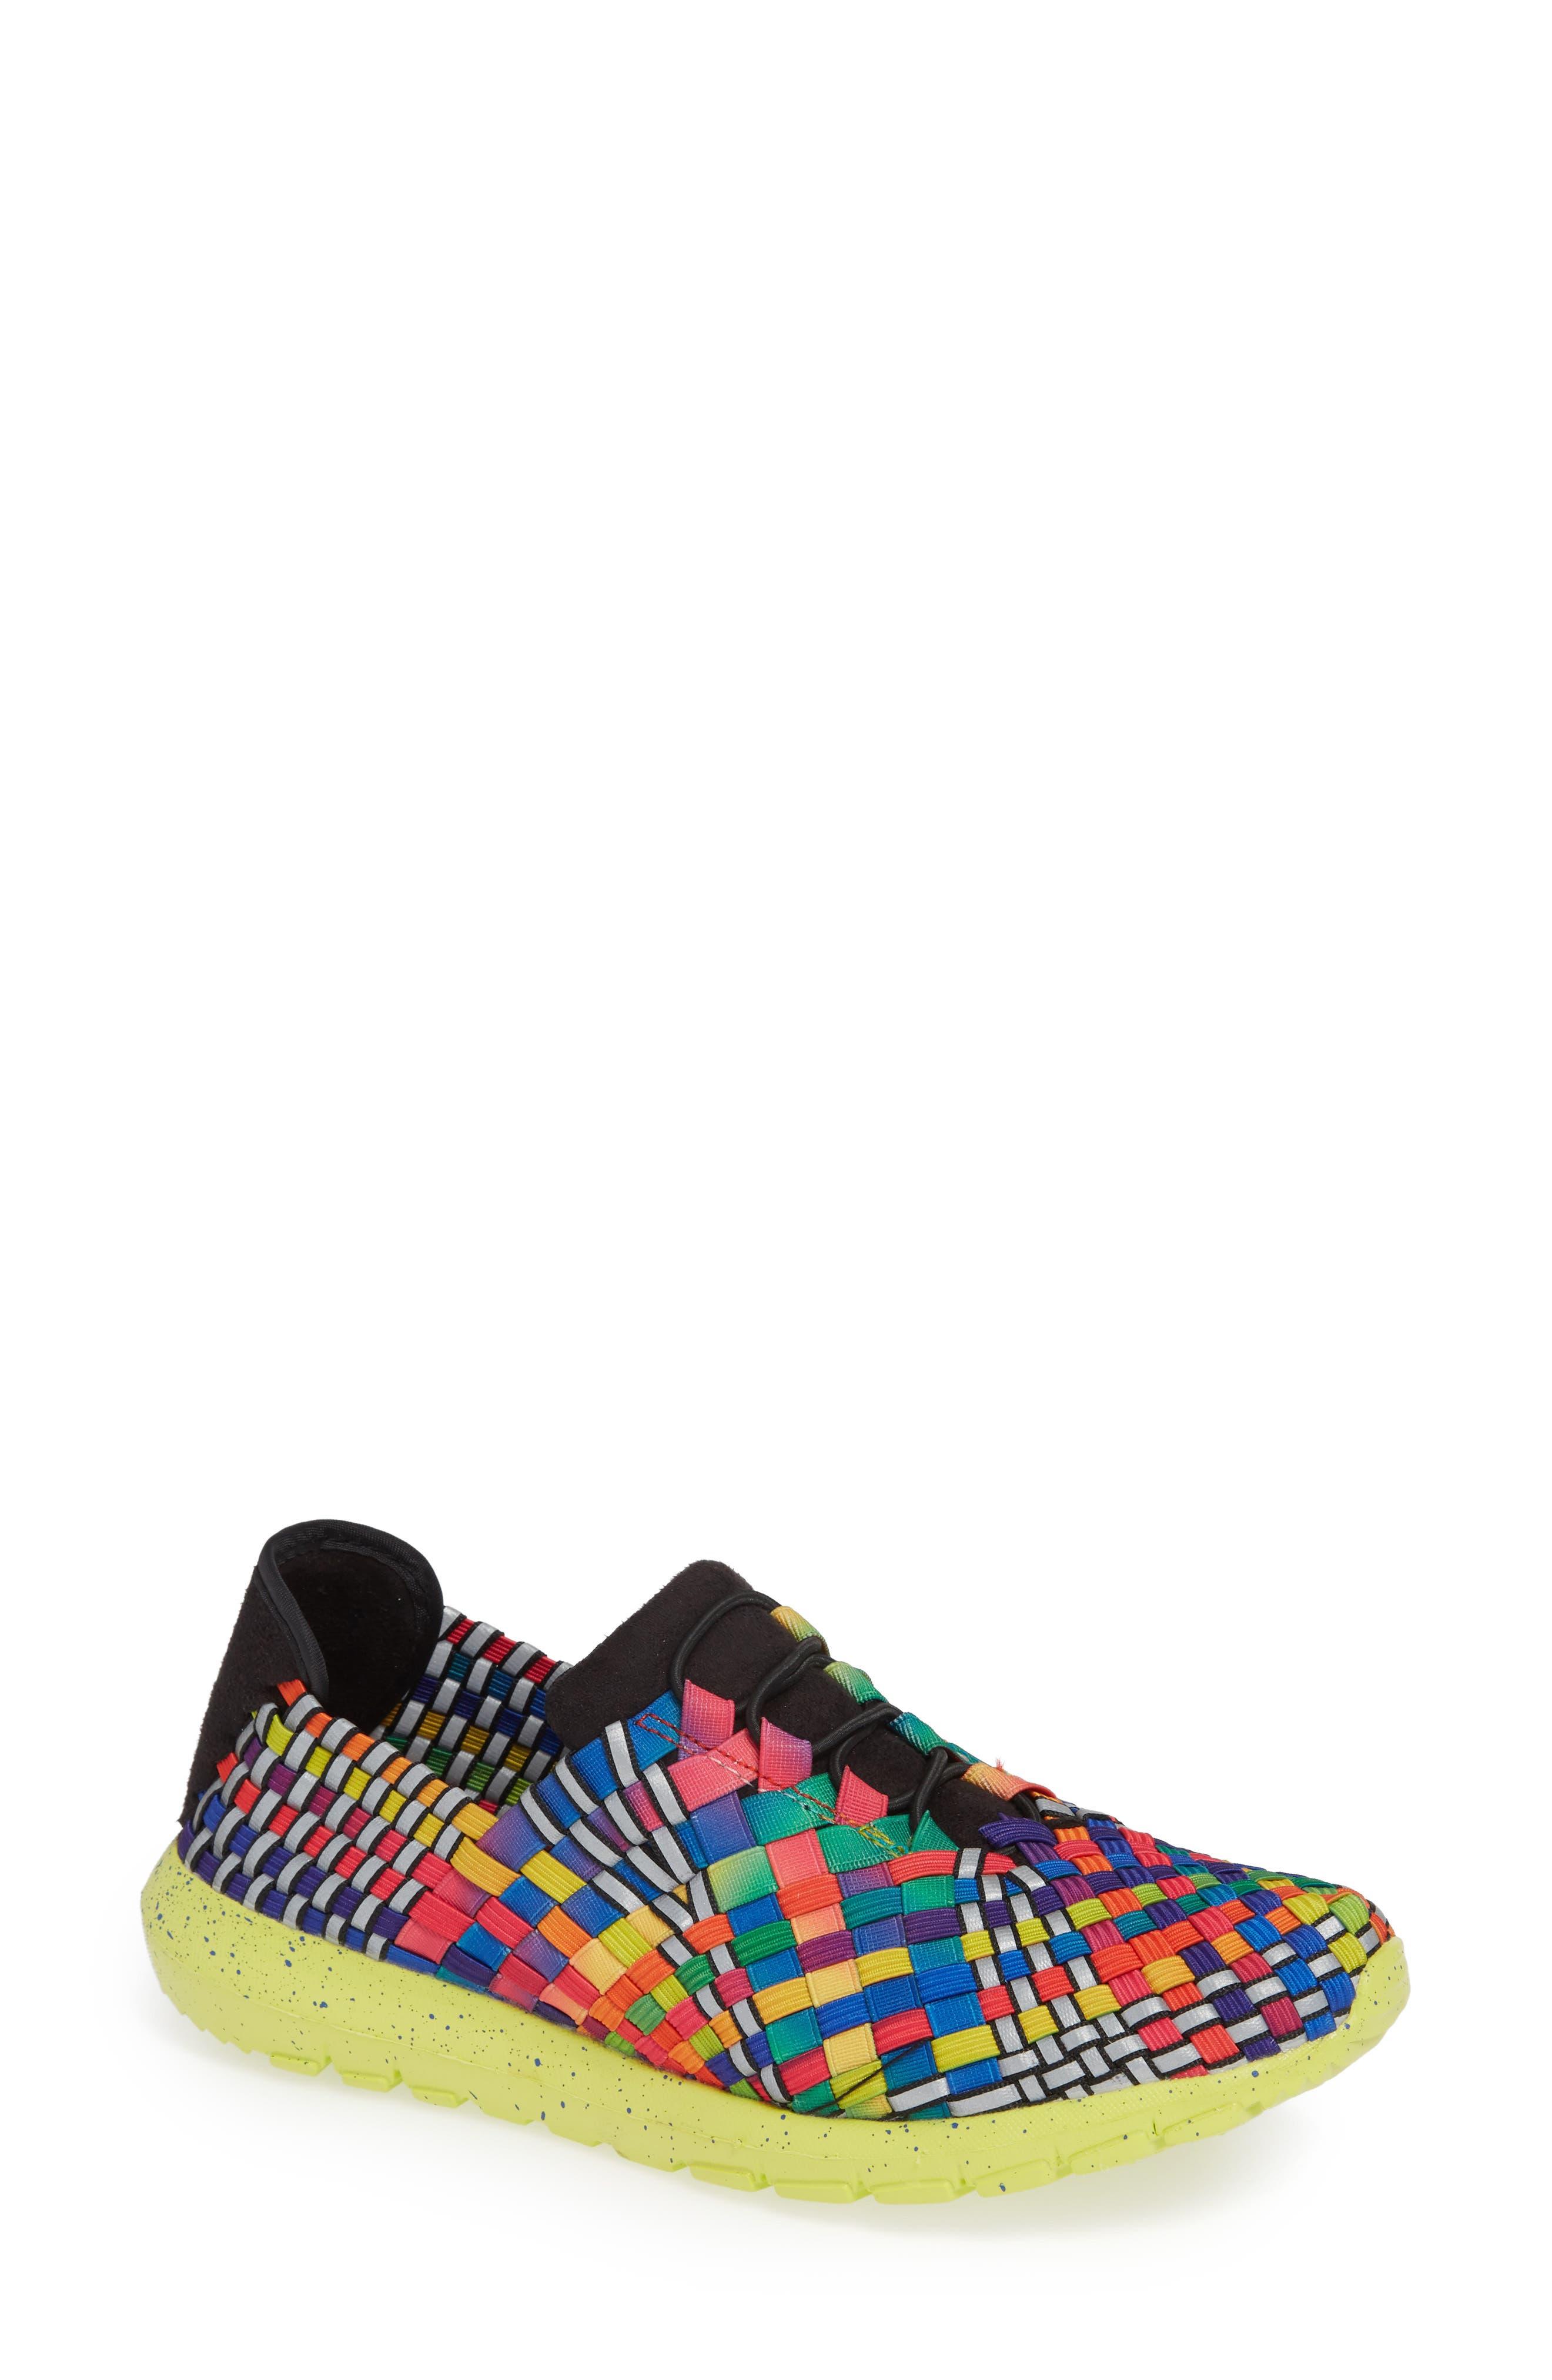 Runners Victoria Sneaker,                             Main thumbnail 1, color,                             Black Multi Reflective Fabric